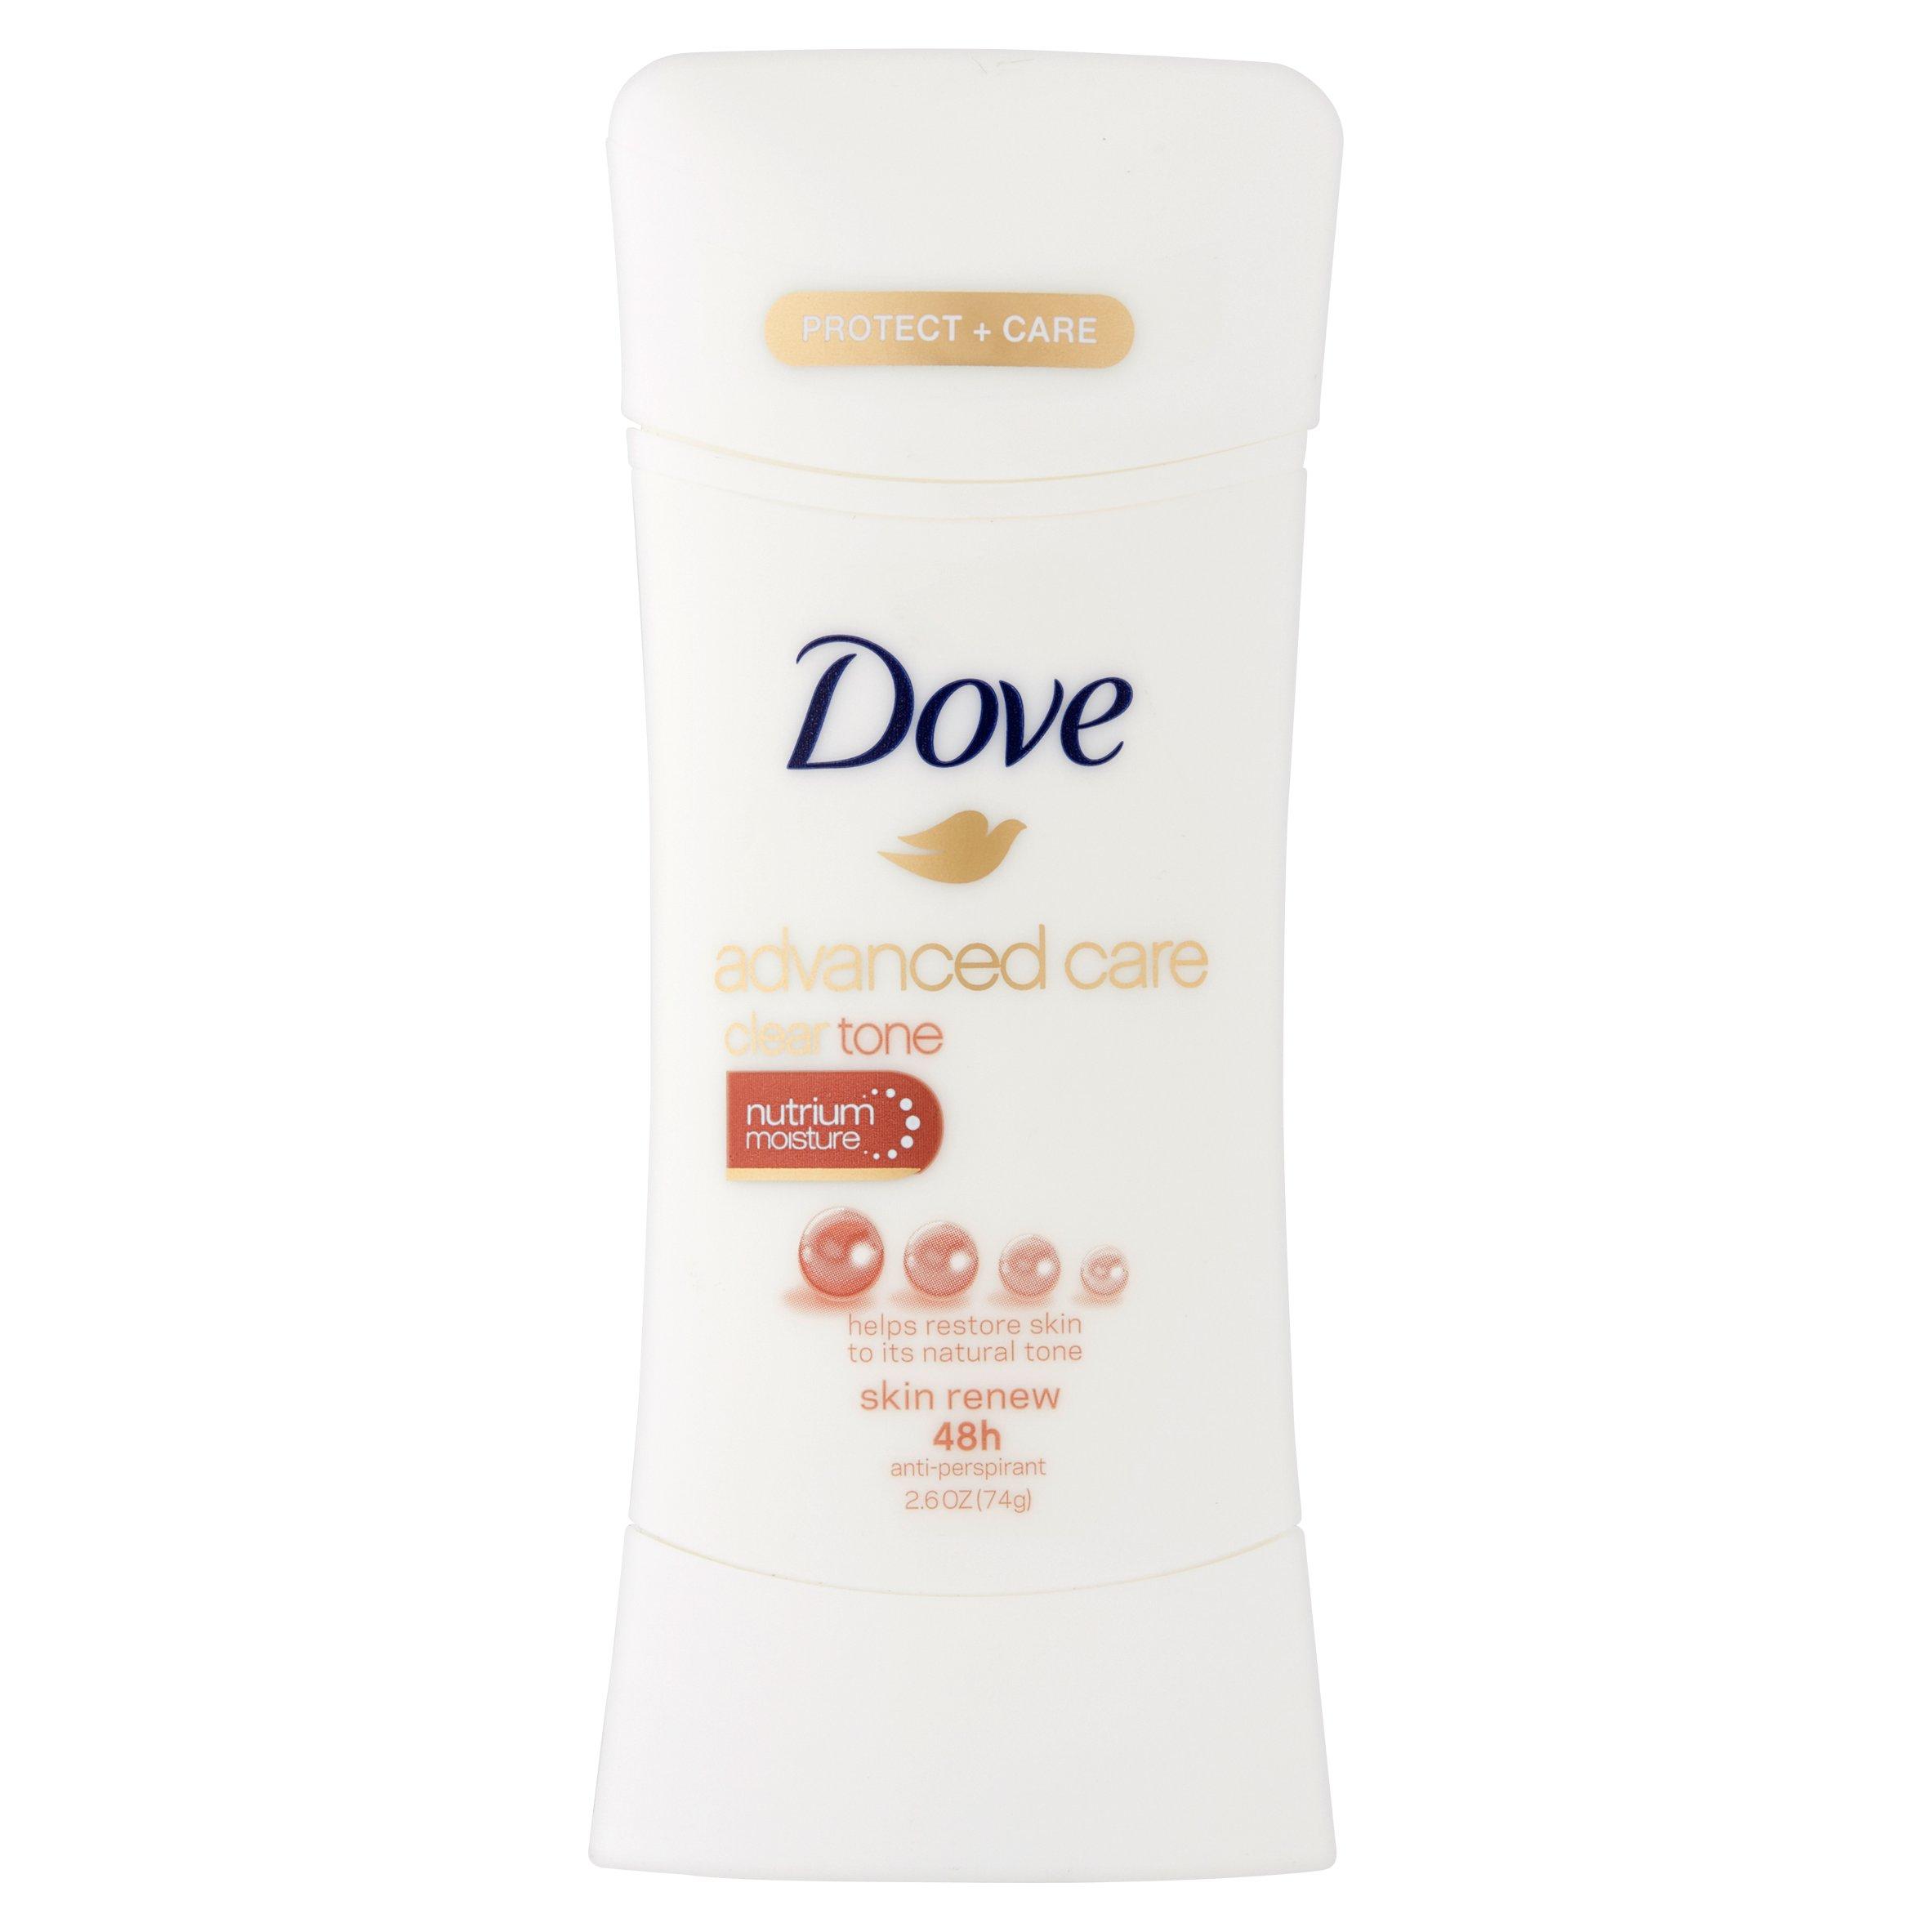 dove advanced care clear tone skin renew antiperspirant